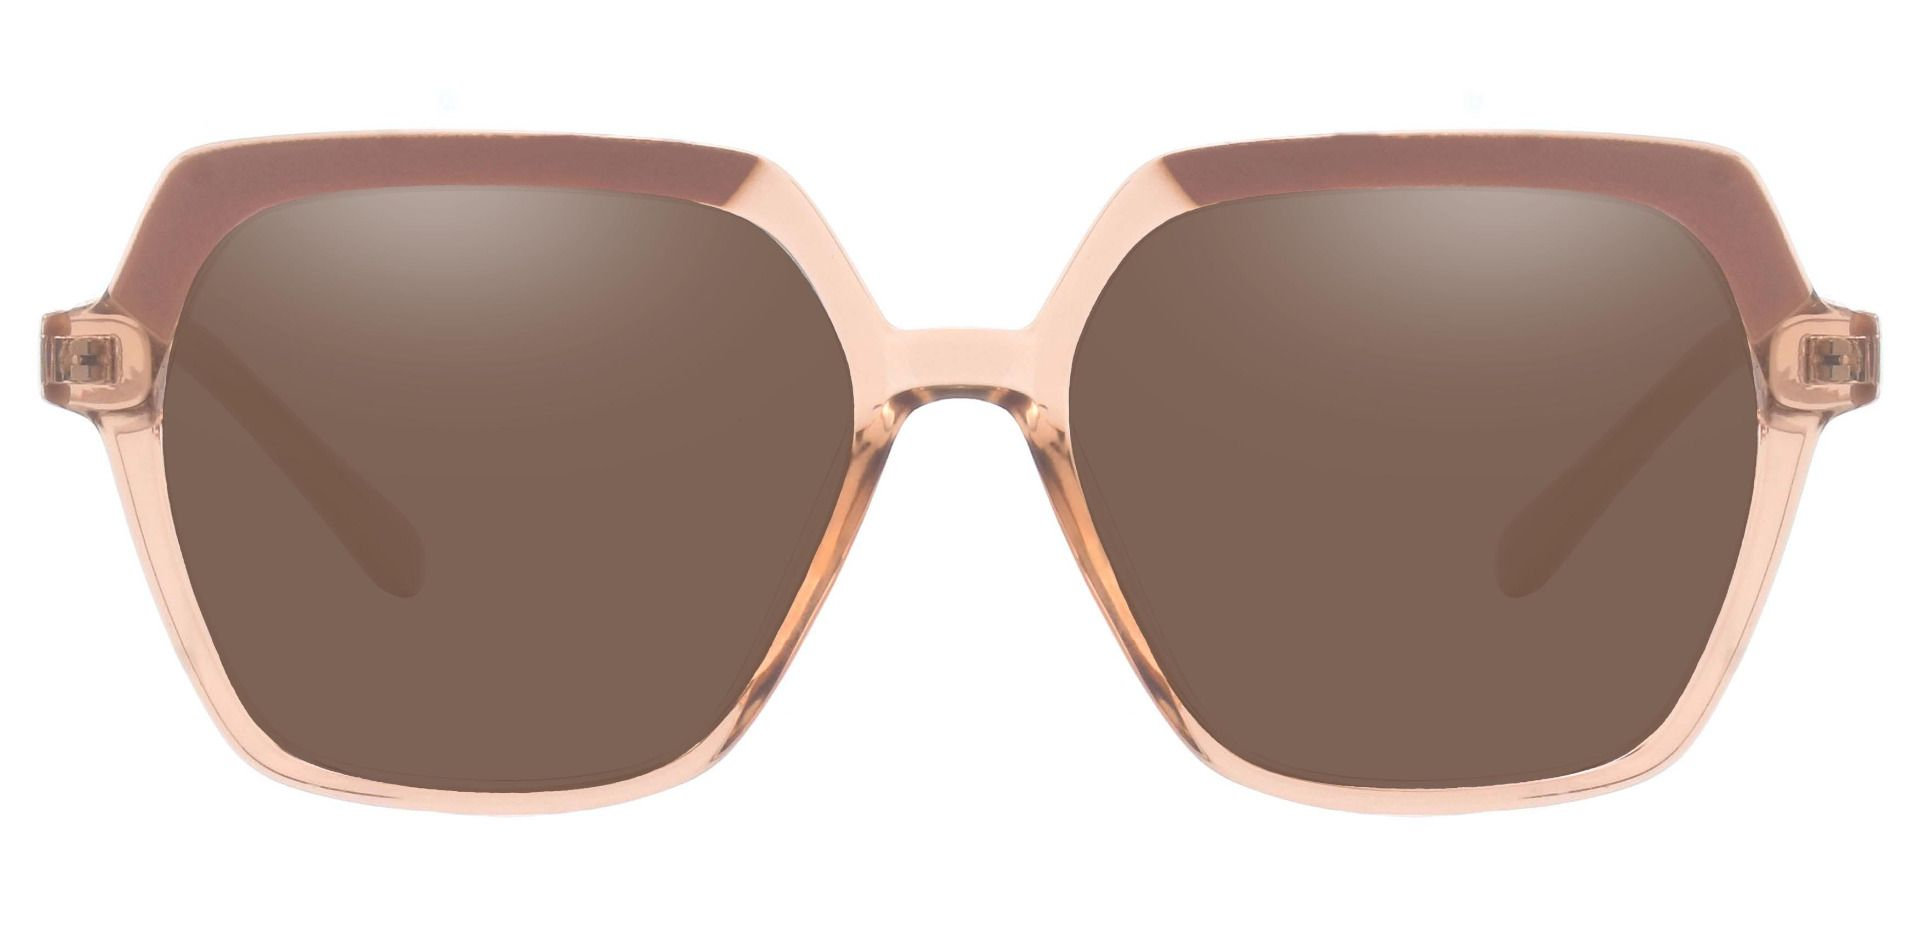 Regent Geometric Progressive Sunglasses - Brown Frame With Brown Lenses